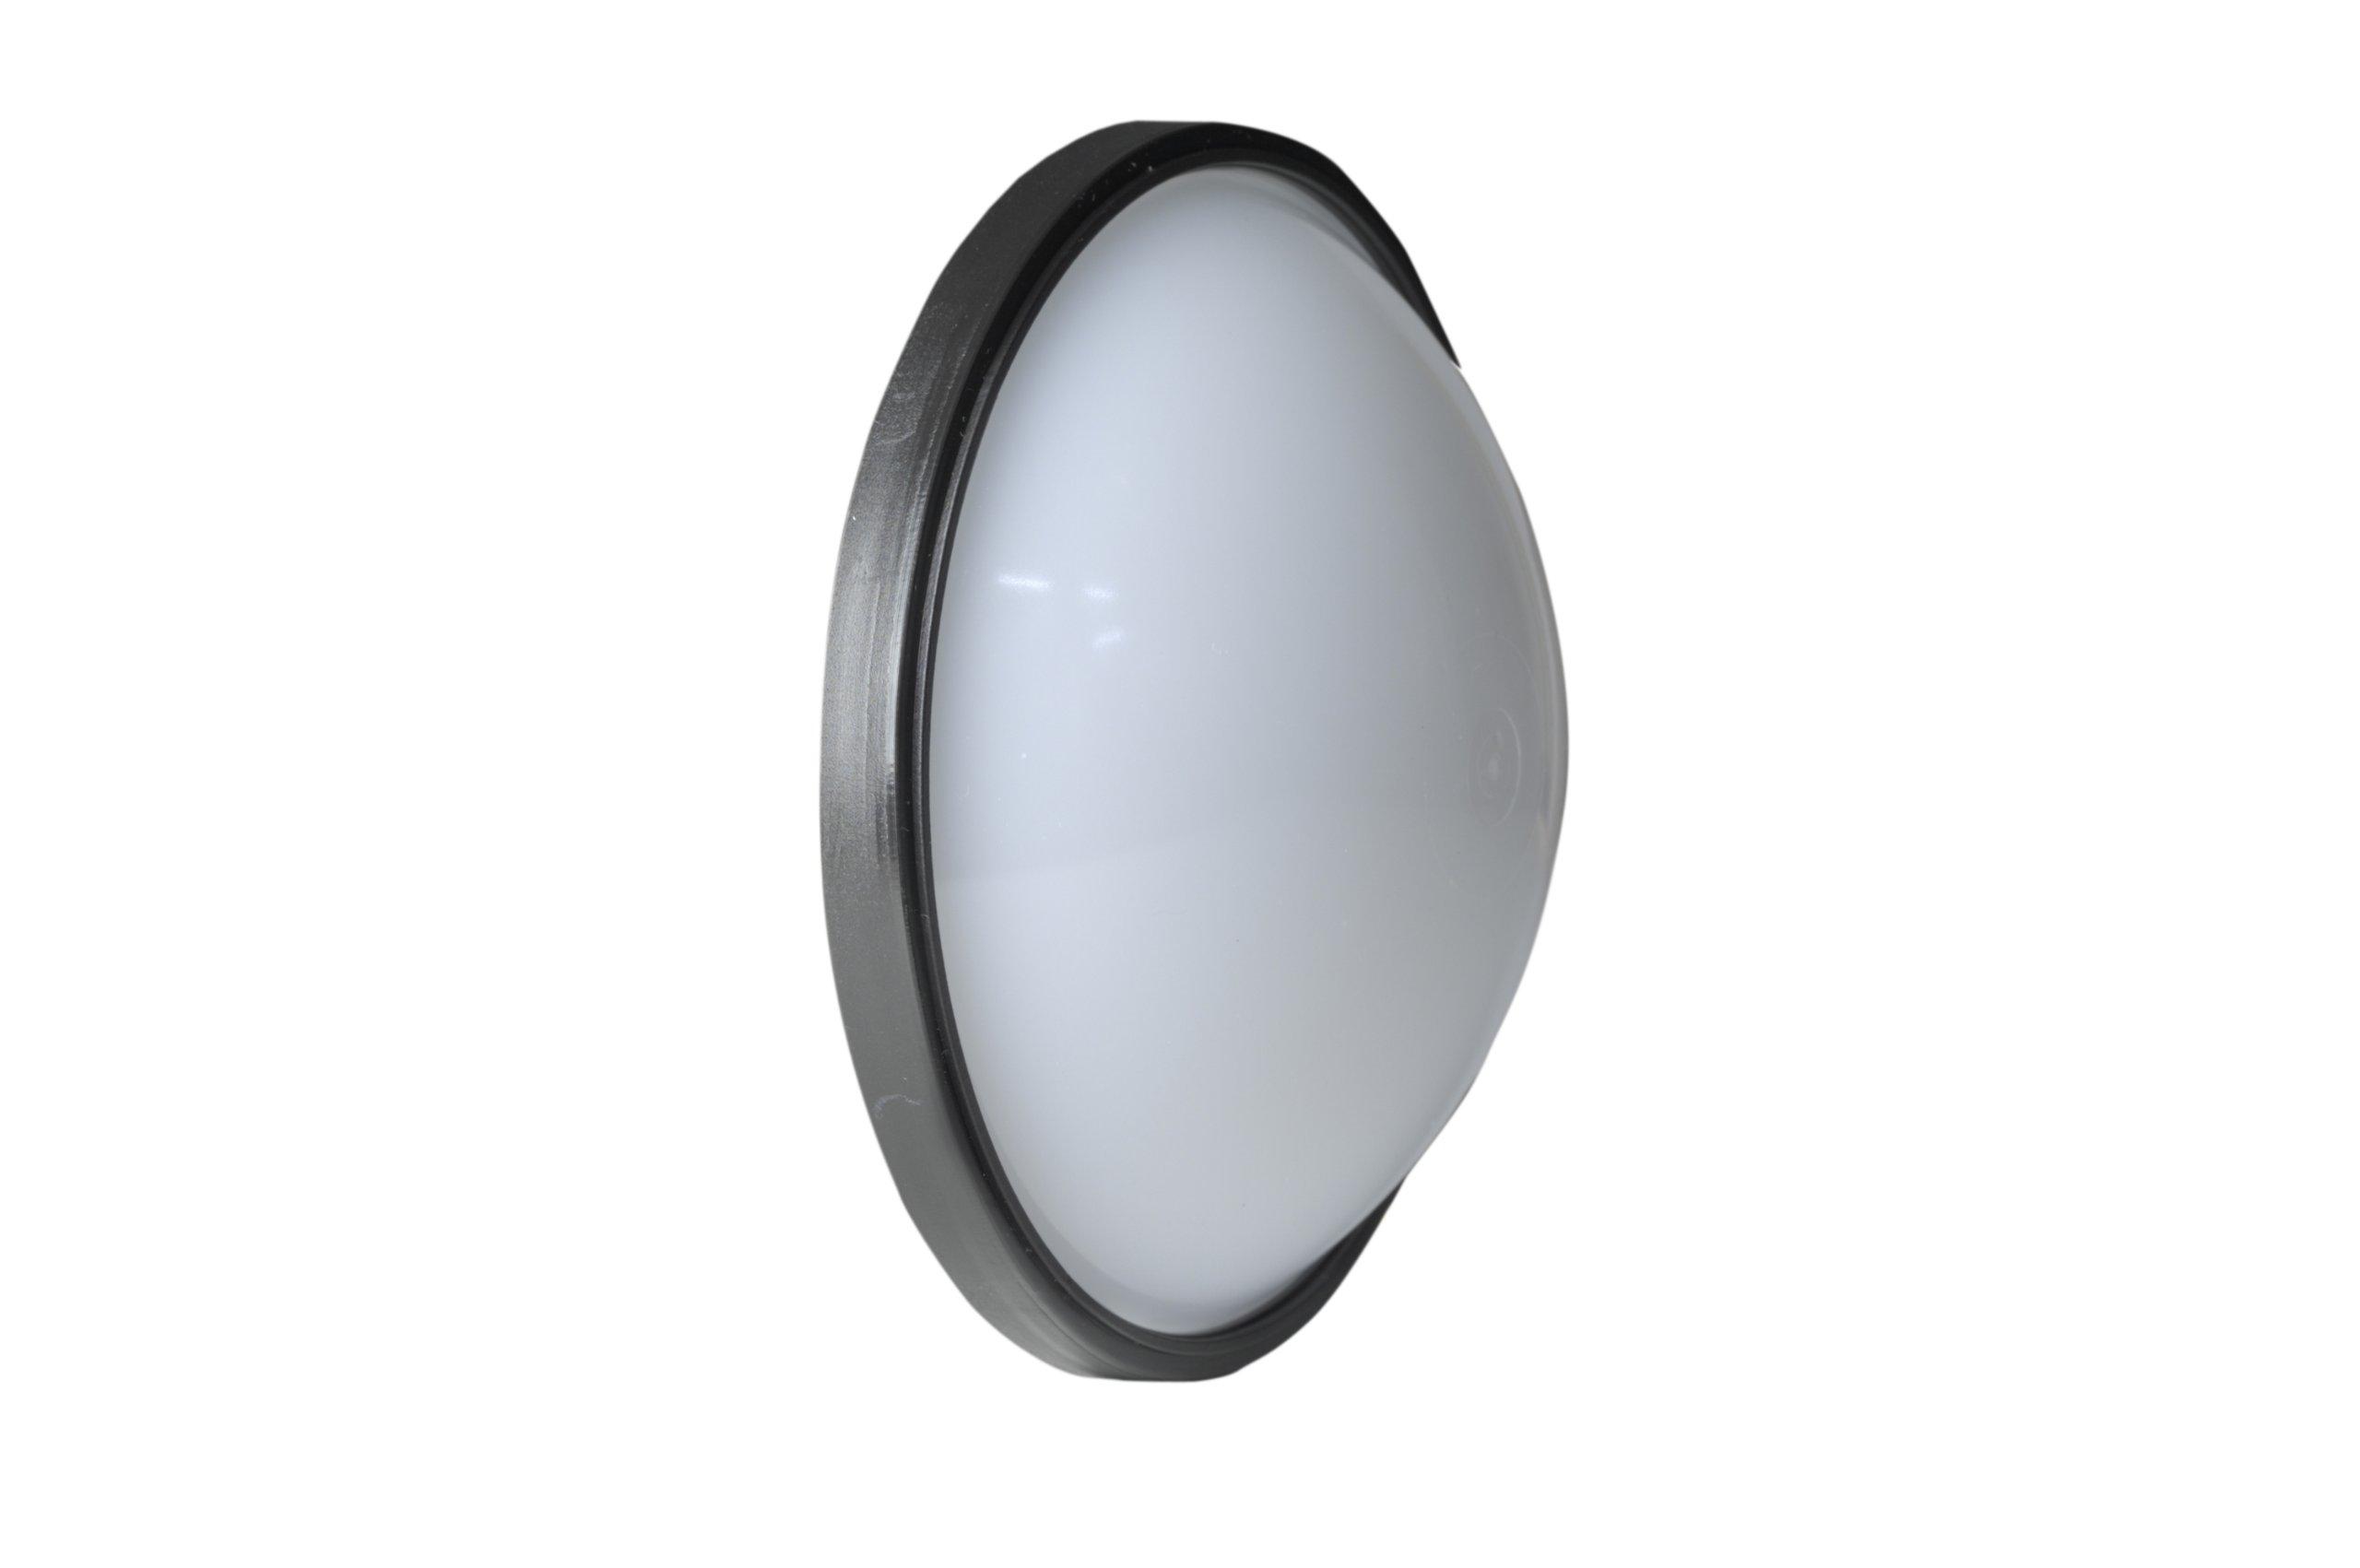 Quantum Qflash T & X Series Wide Angle Diffuser for Reflector (QF67A)